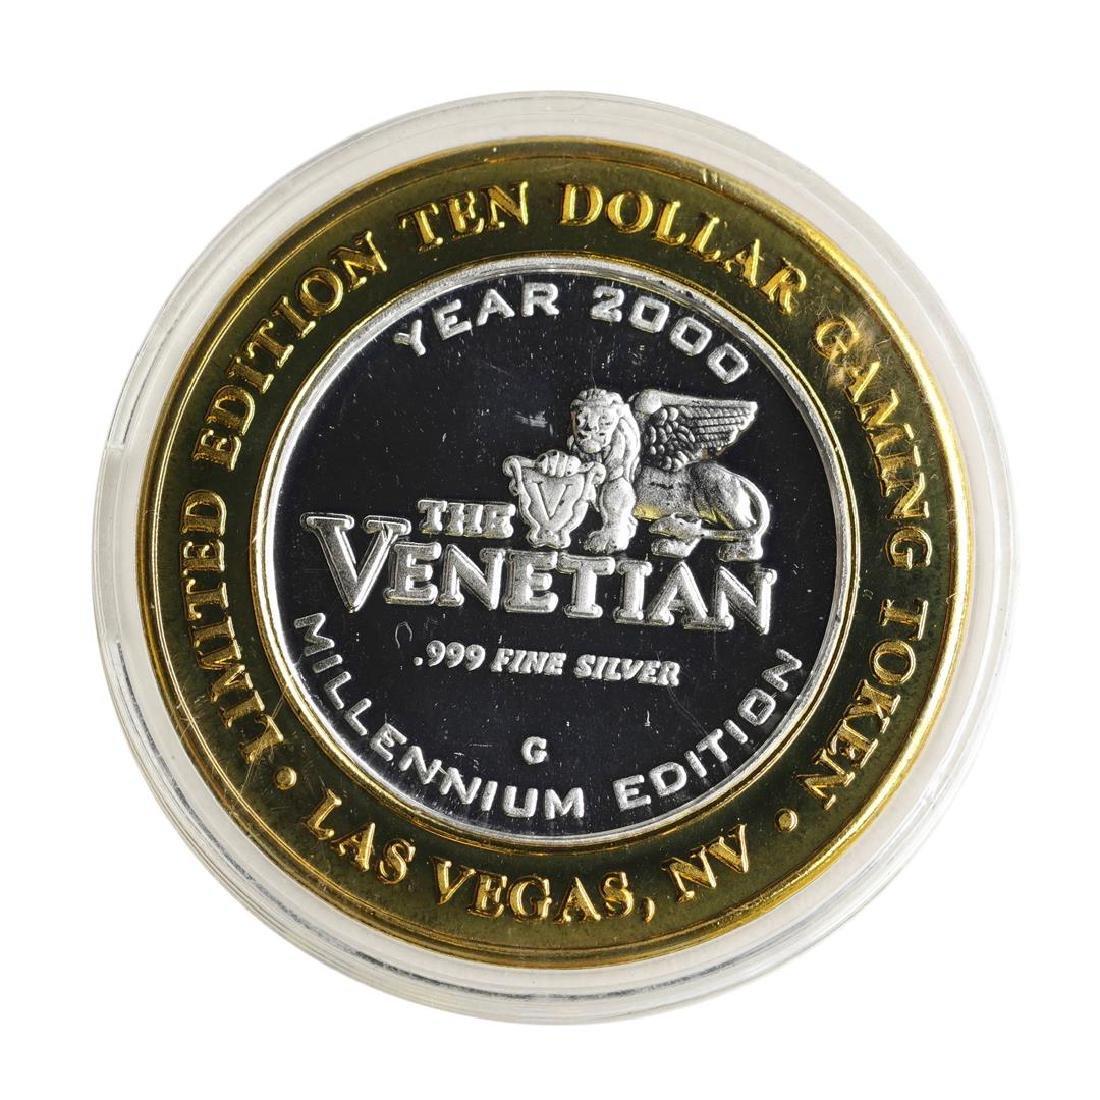 .999 Silver The Venetian Las Vegas, NV $10 Casino